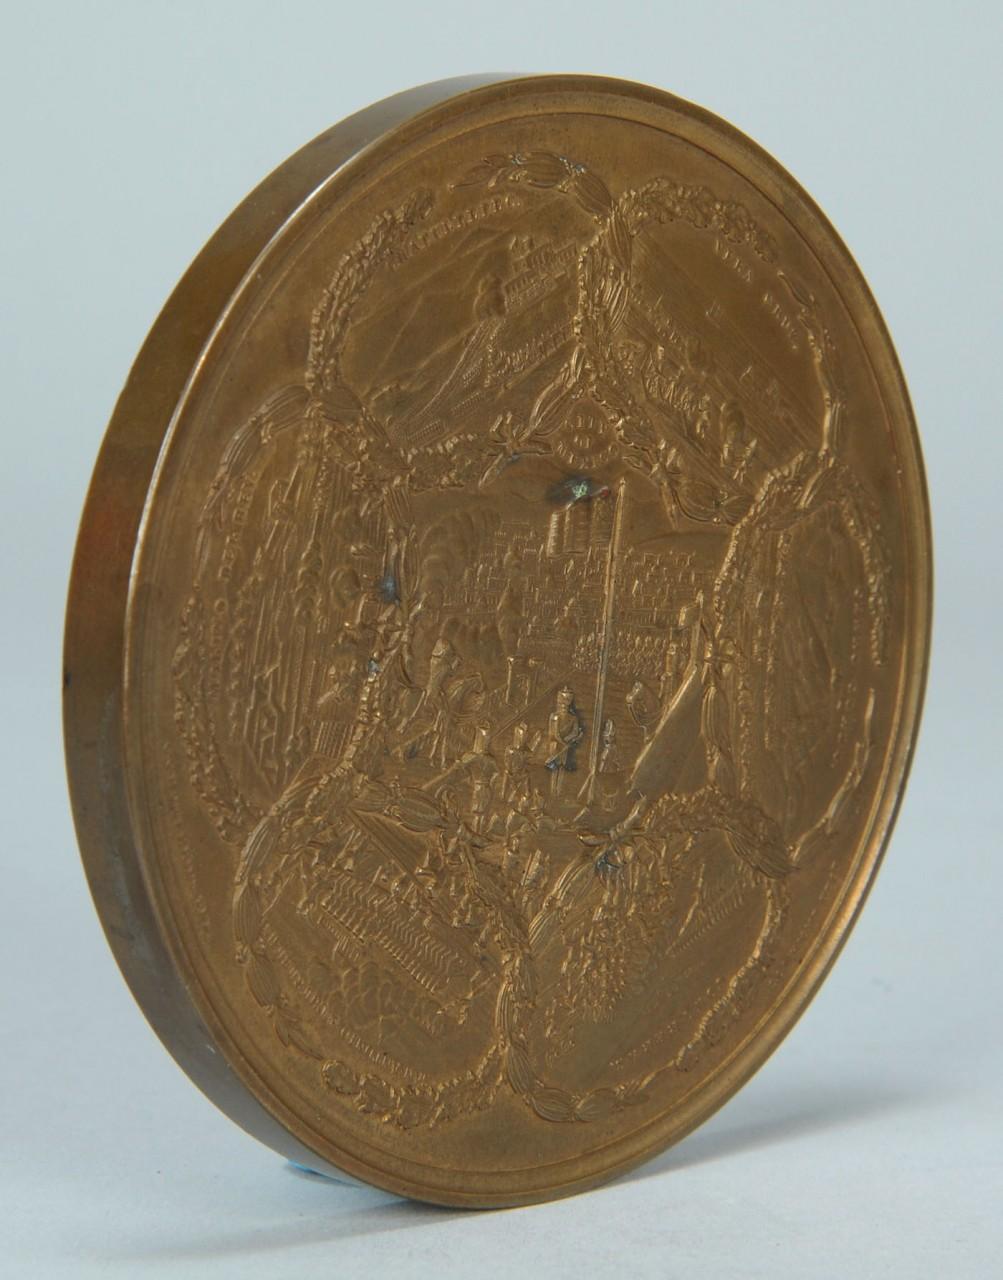 Lot 672: Major Gen. Winfield Scott bronze medal